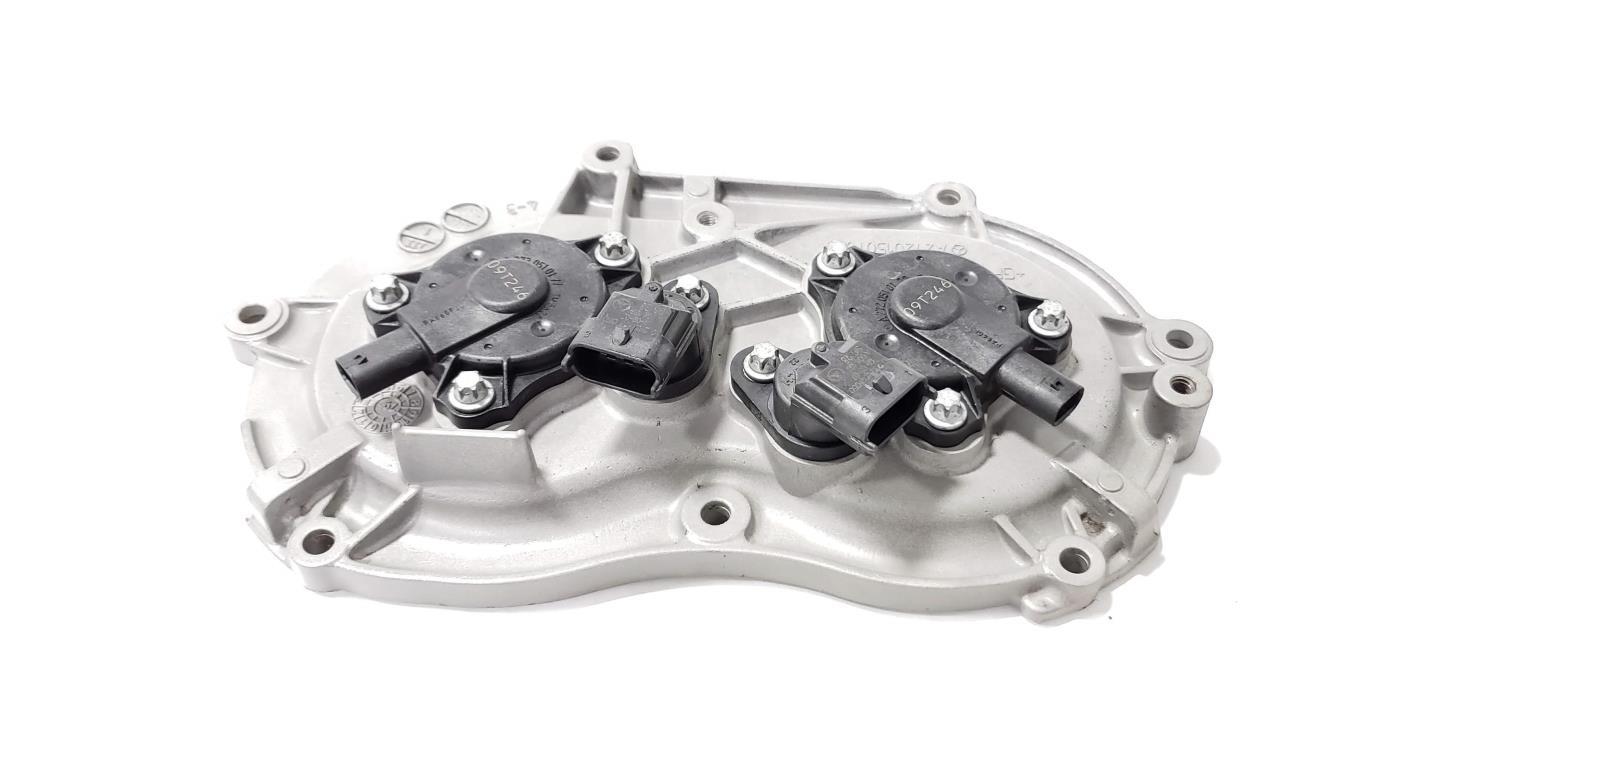 Mercedes Benz Genuine OEM Right Cylinder Upper Engine Timing Cover 2720150101